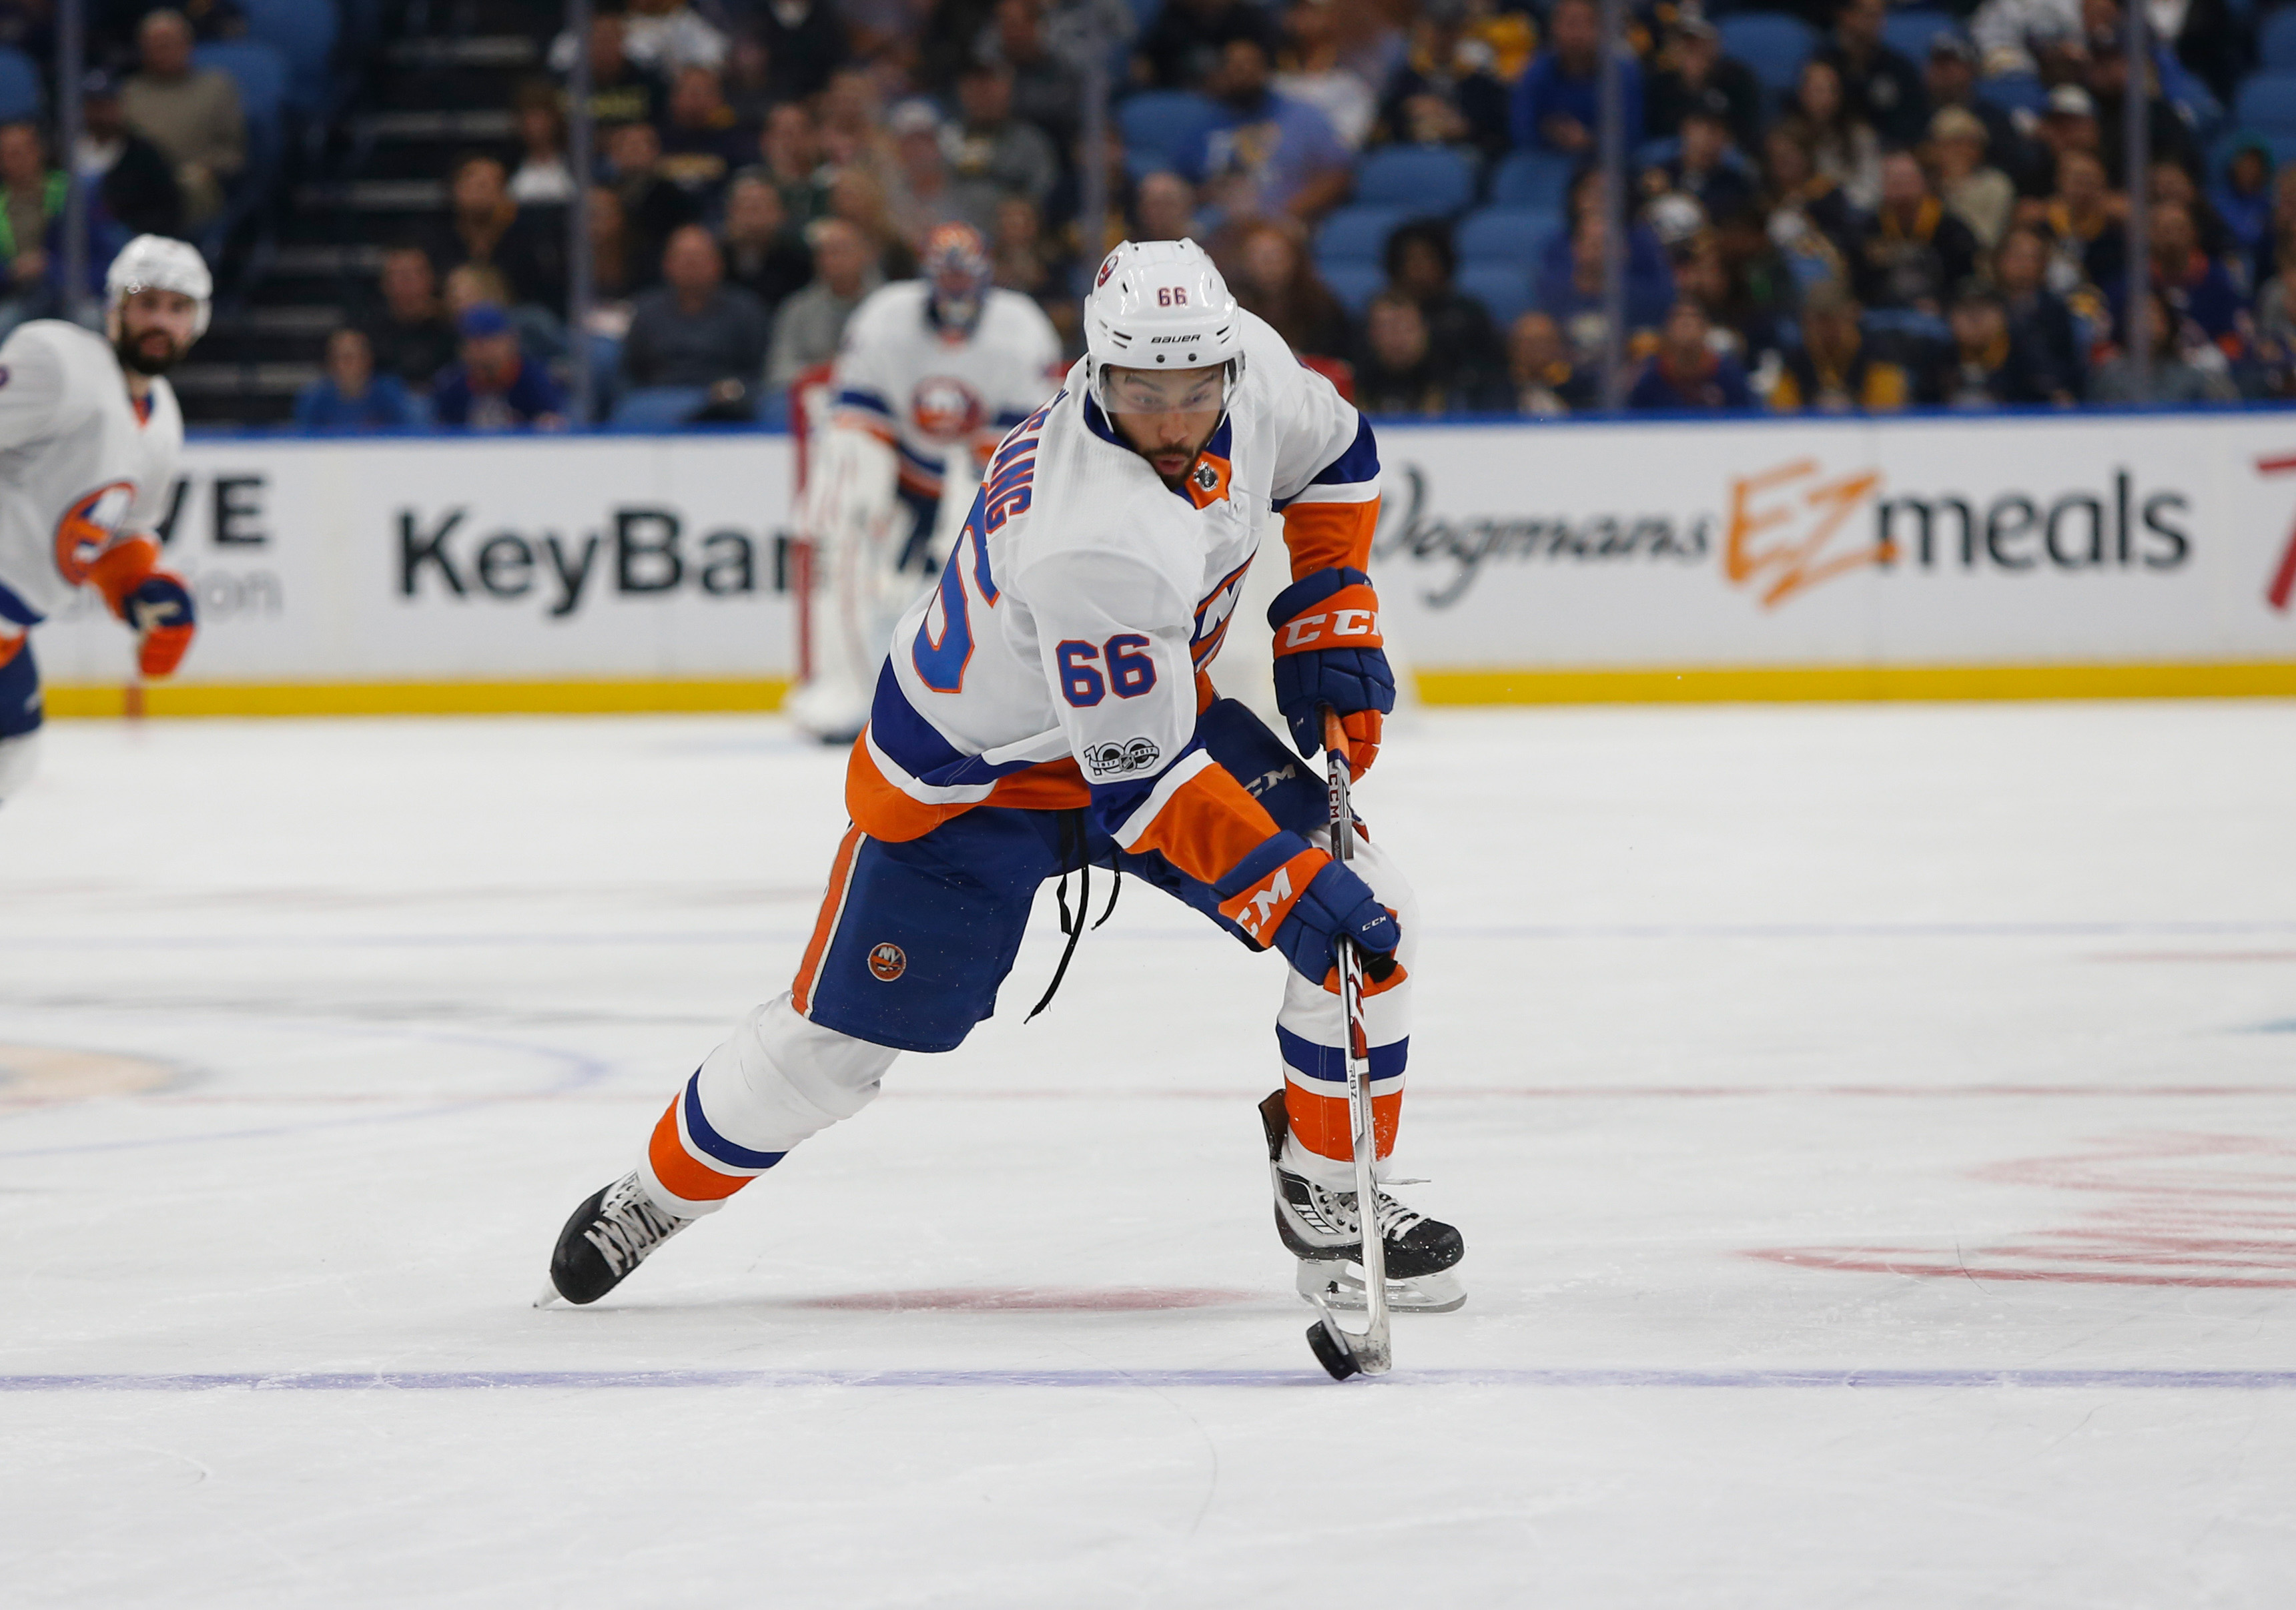 Ho-Sang will report to AHL Bridgeport